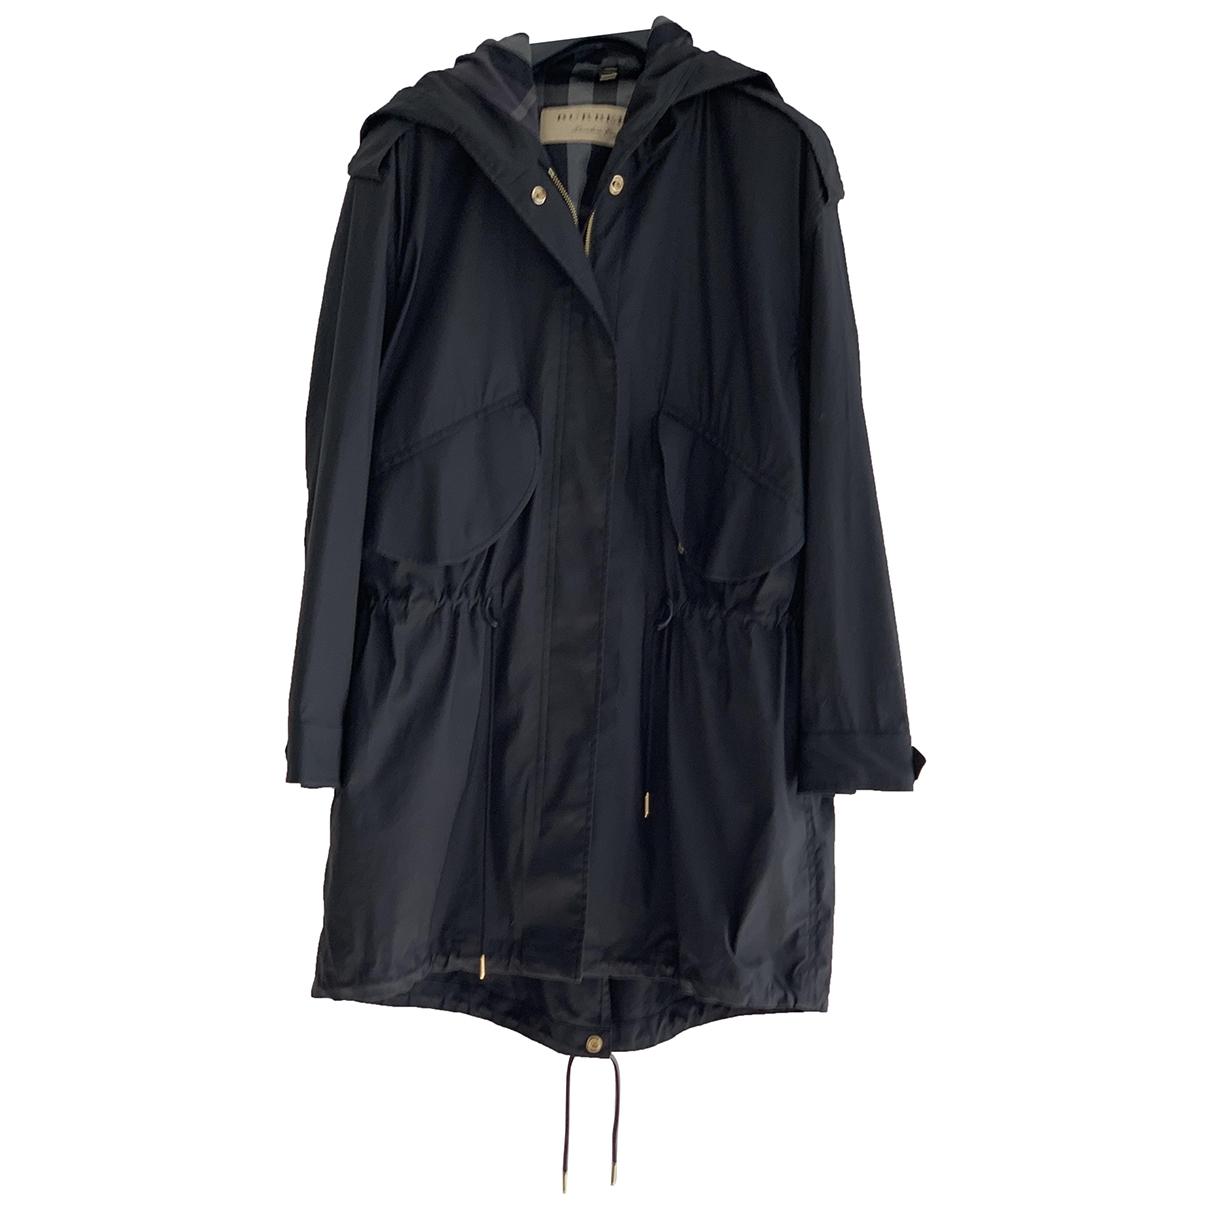 Burberry \N Black Cotton coat for Women M International